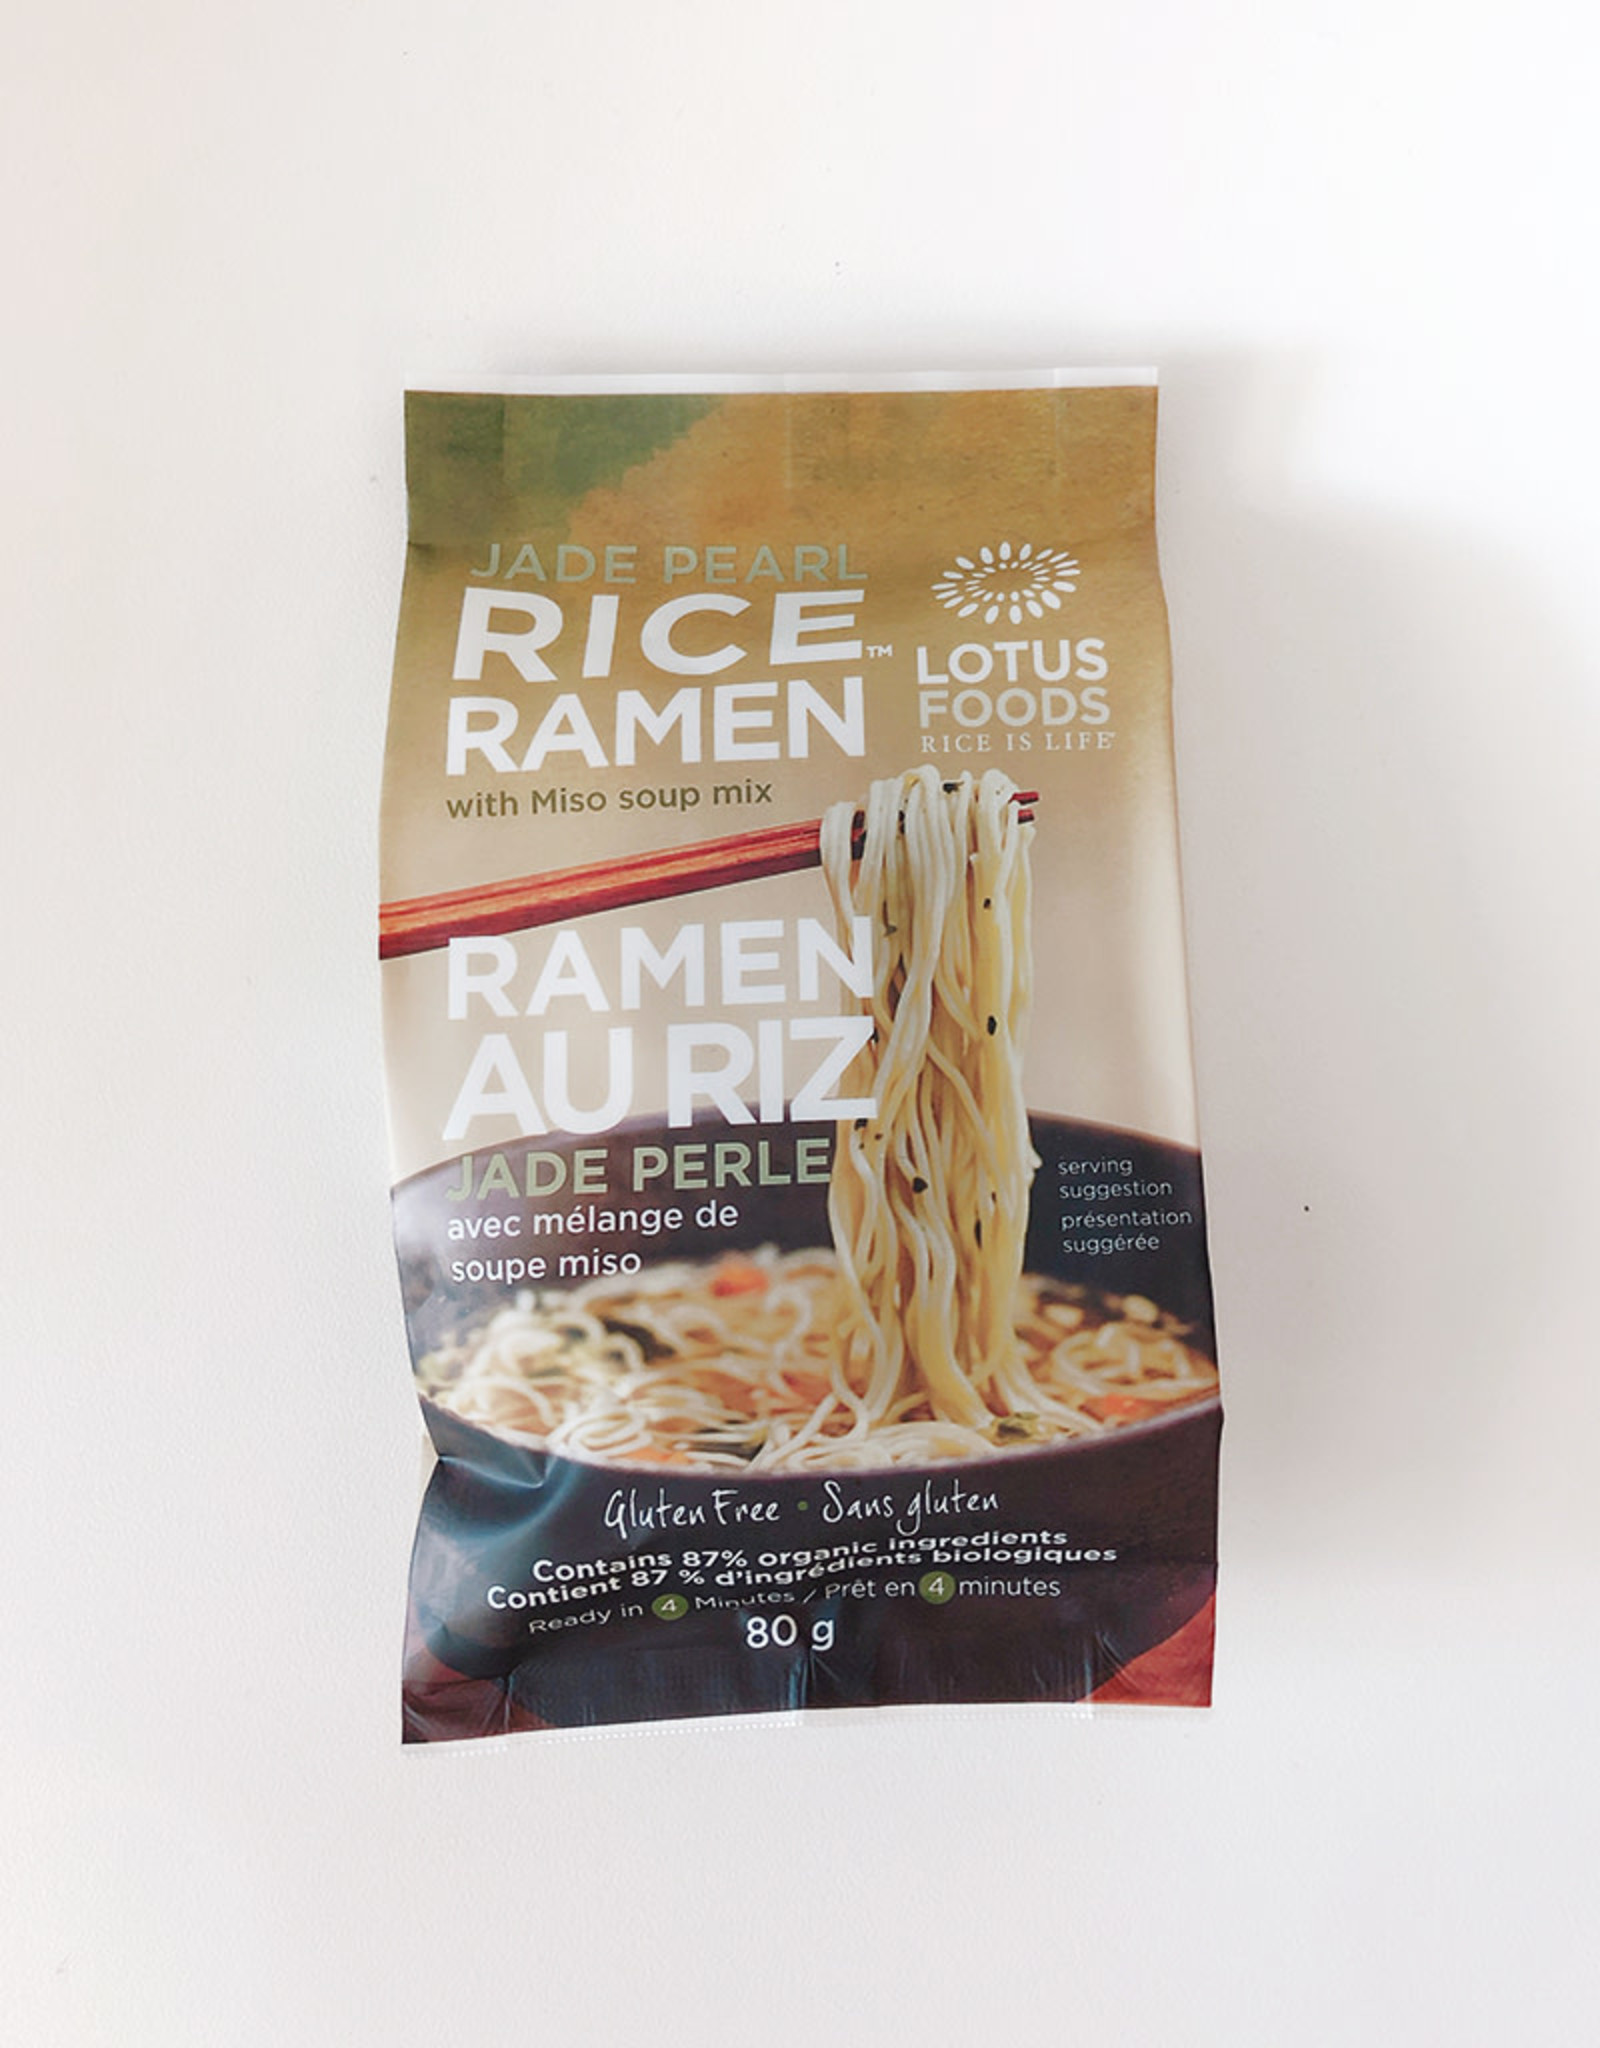 Lotus Foods Lotus Foods - Rice Ramen with Miso Soup, Jade Pearl Rice (80g)